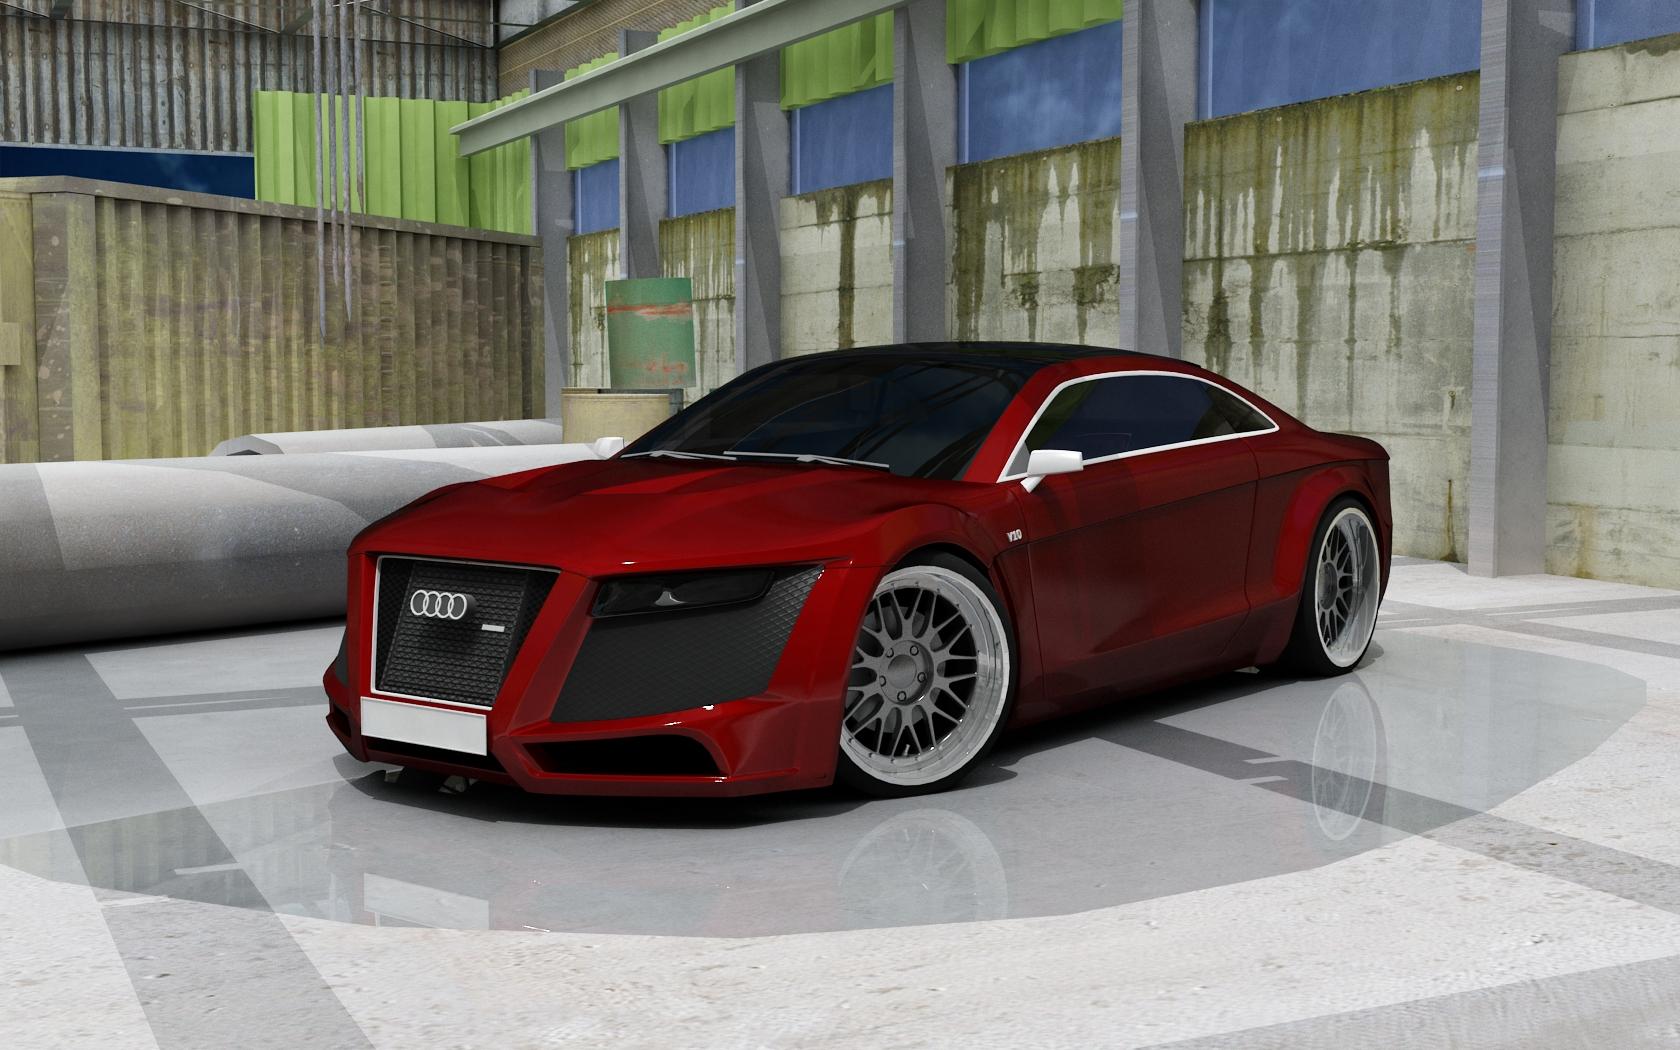 Kelebihan Kekurangan Audi Rs10 Murah Berkualitas